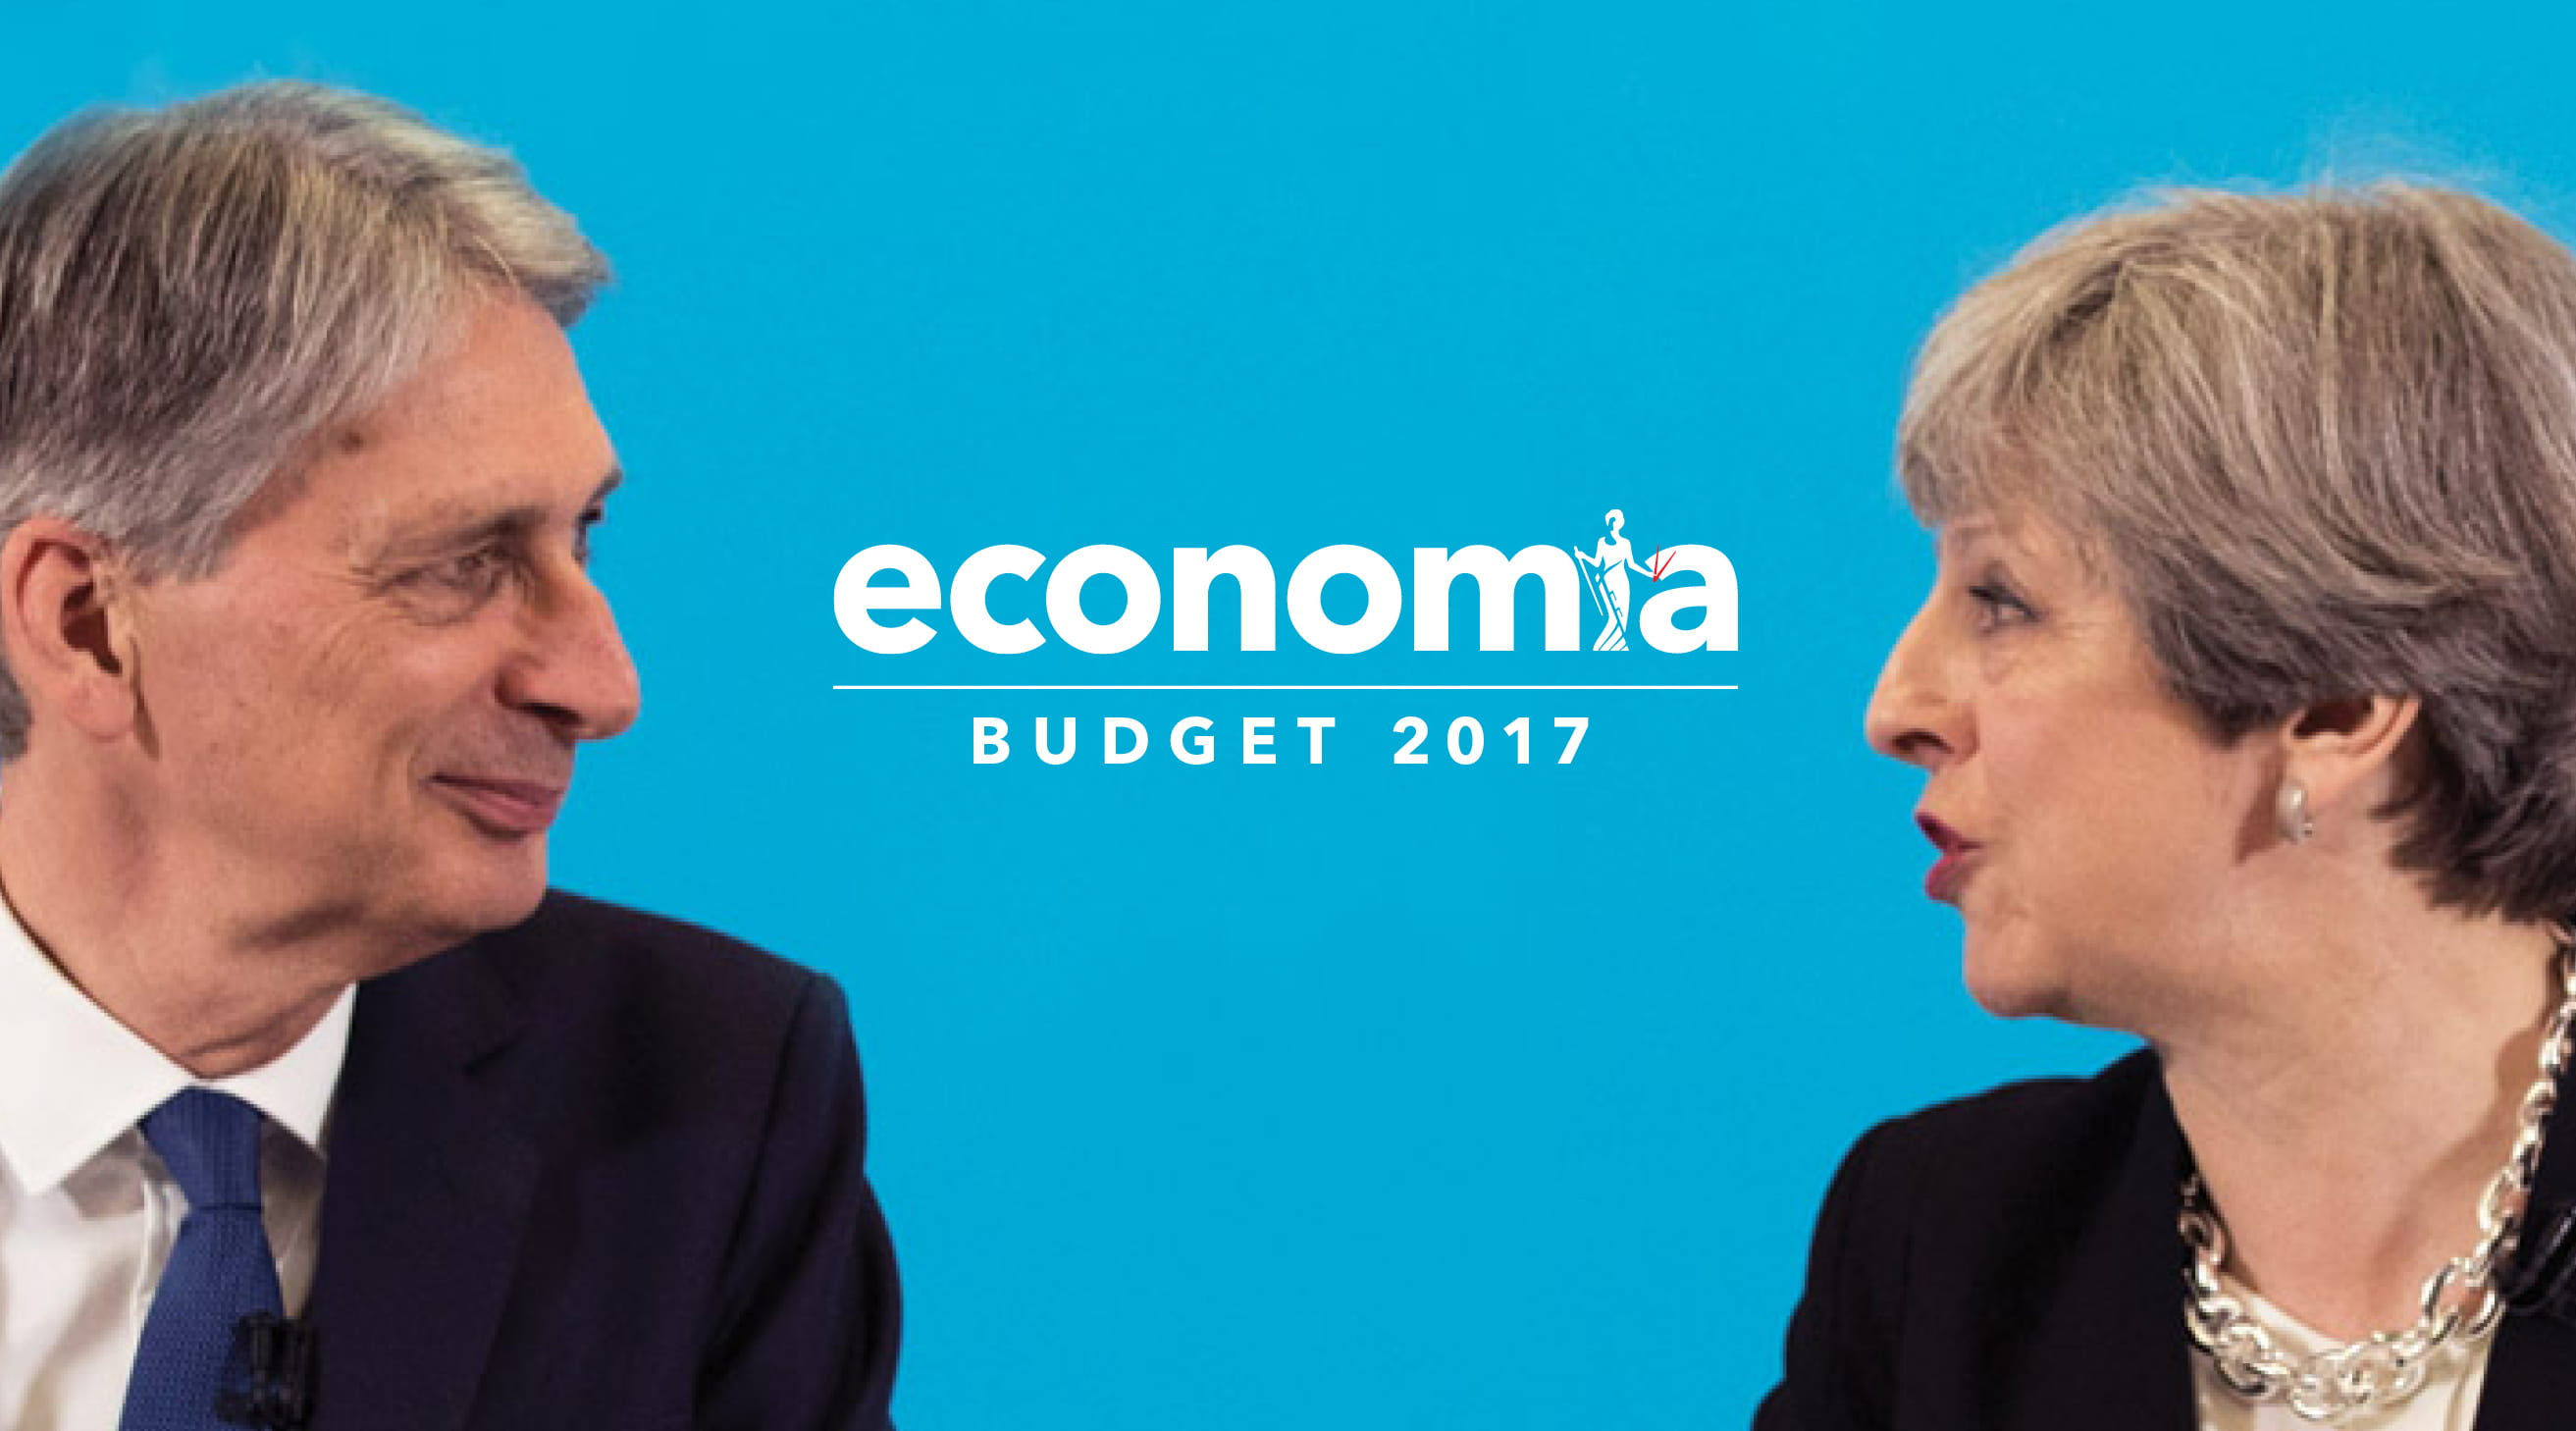 https://economia.icaew.com:443/-/media/economia/images/article-images/budget17x630.ashx